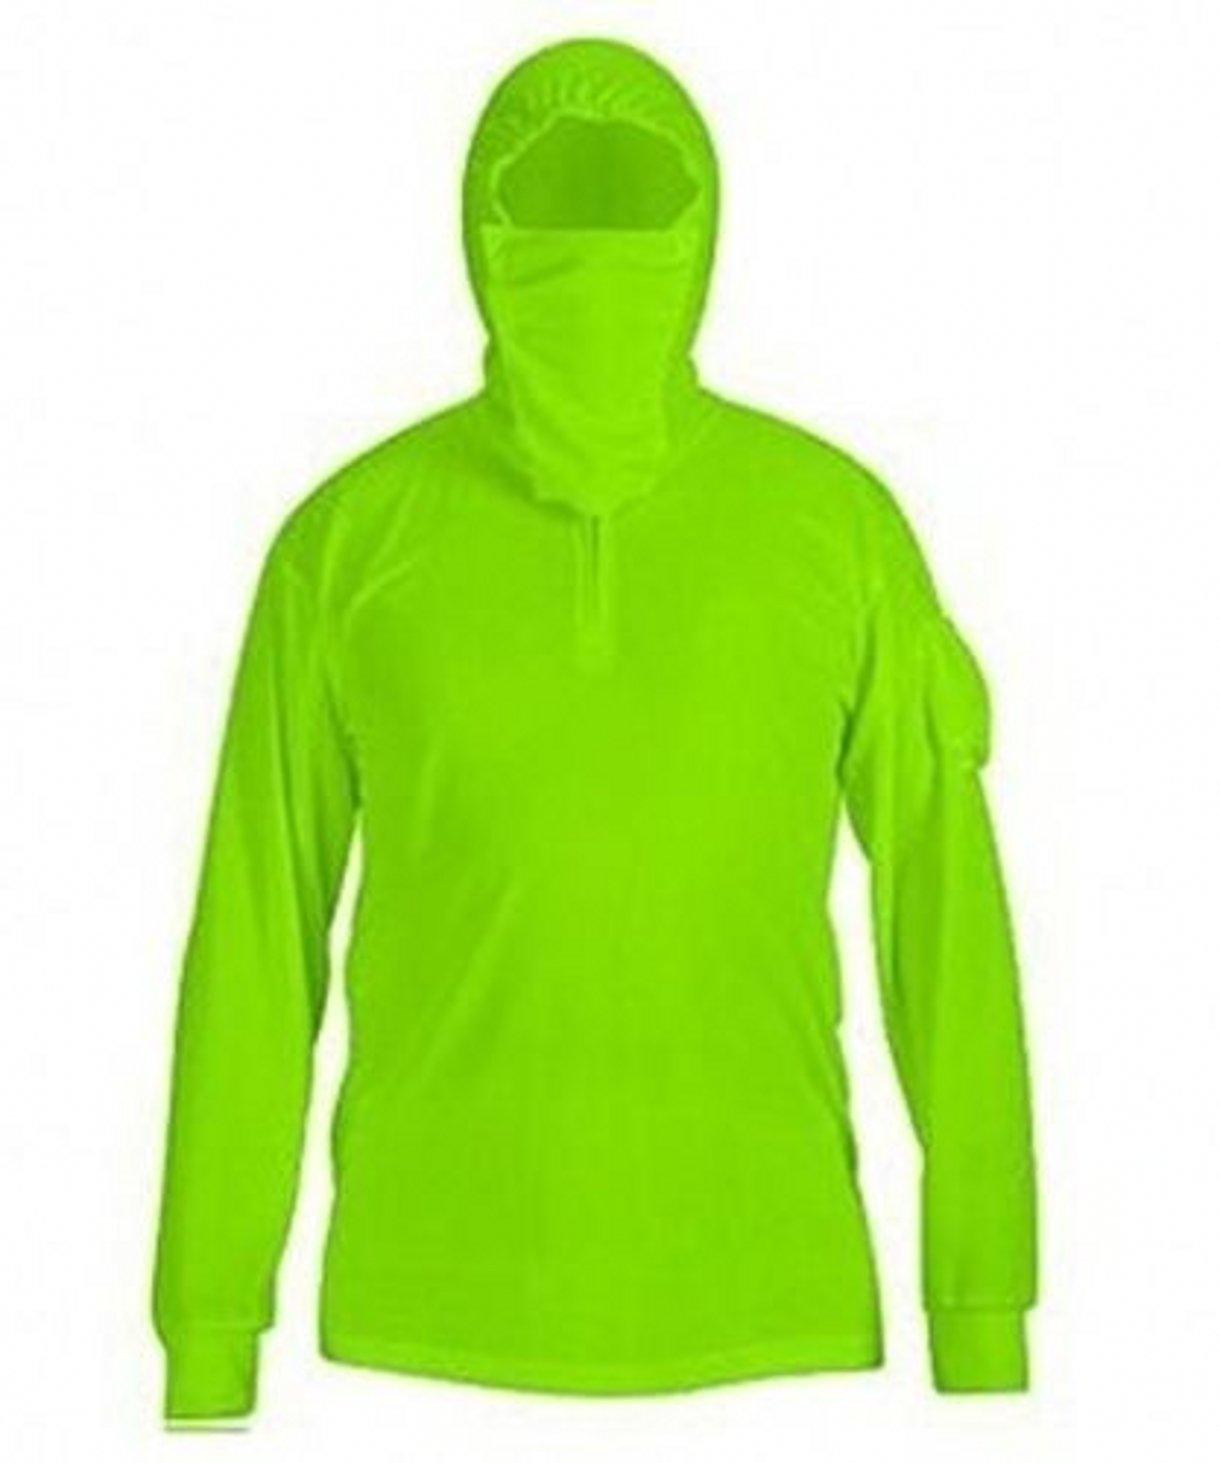 Venxic Men's Fishing Shirts for Men Long Sleeve UV Protection, Quick Dry Sun Shirt/w Thumb Hole (Green, X-Large)